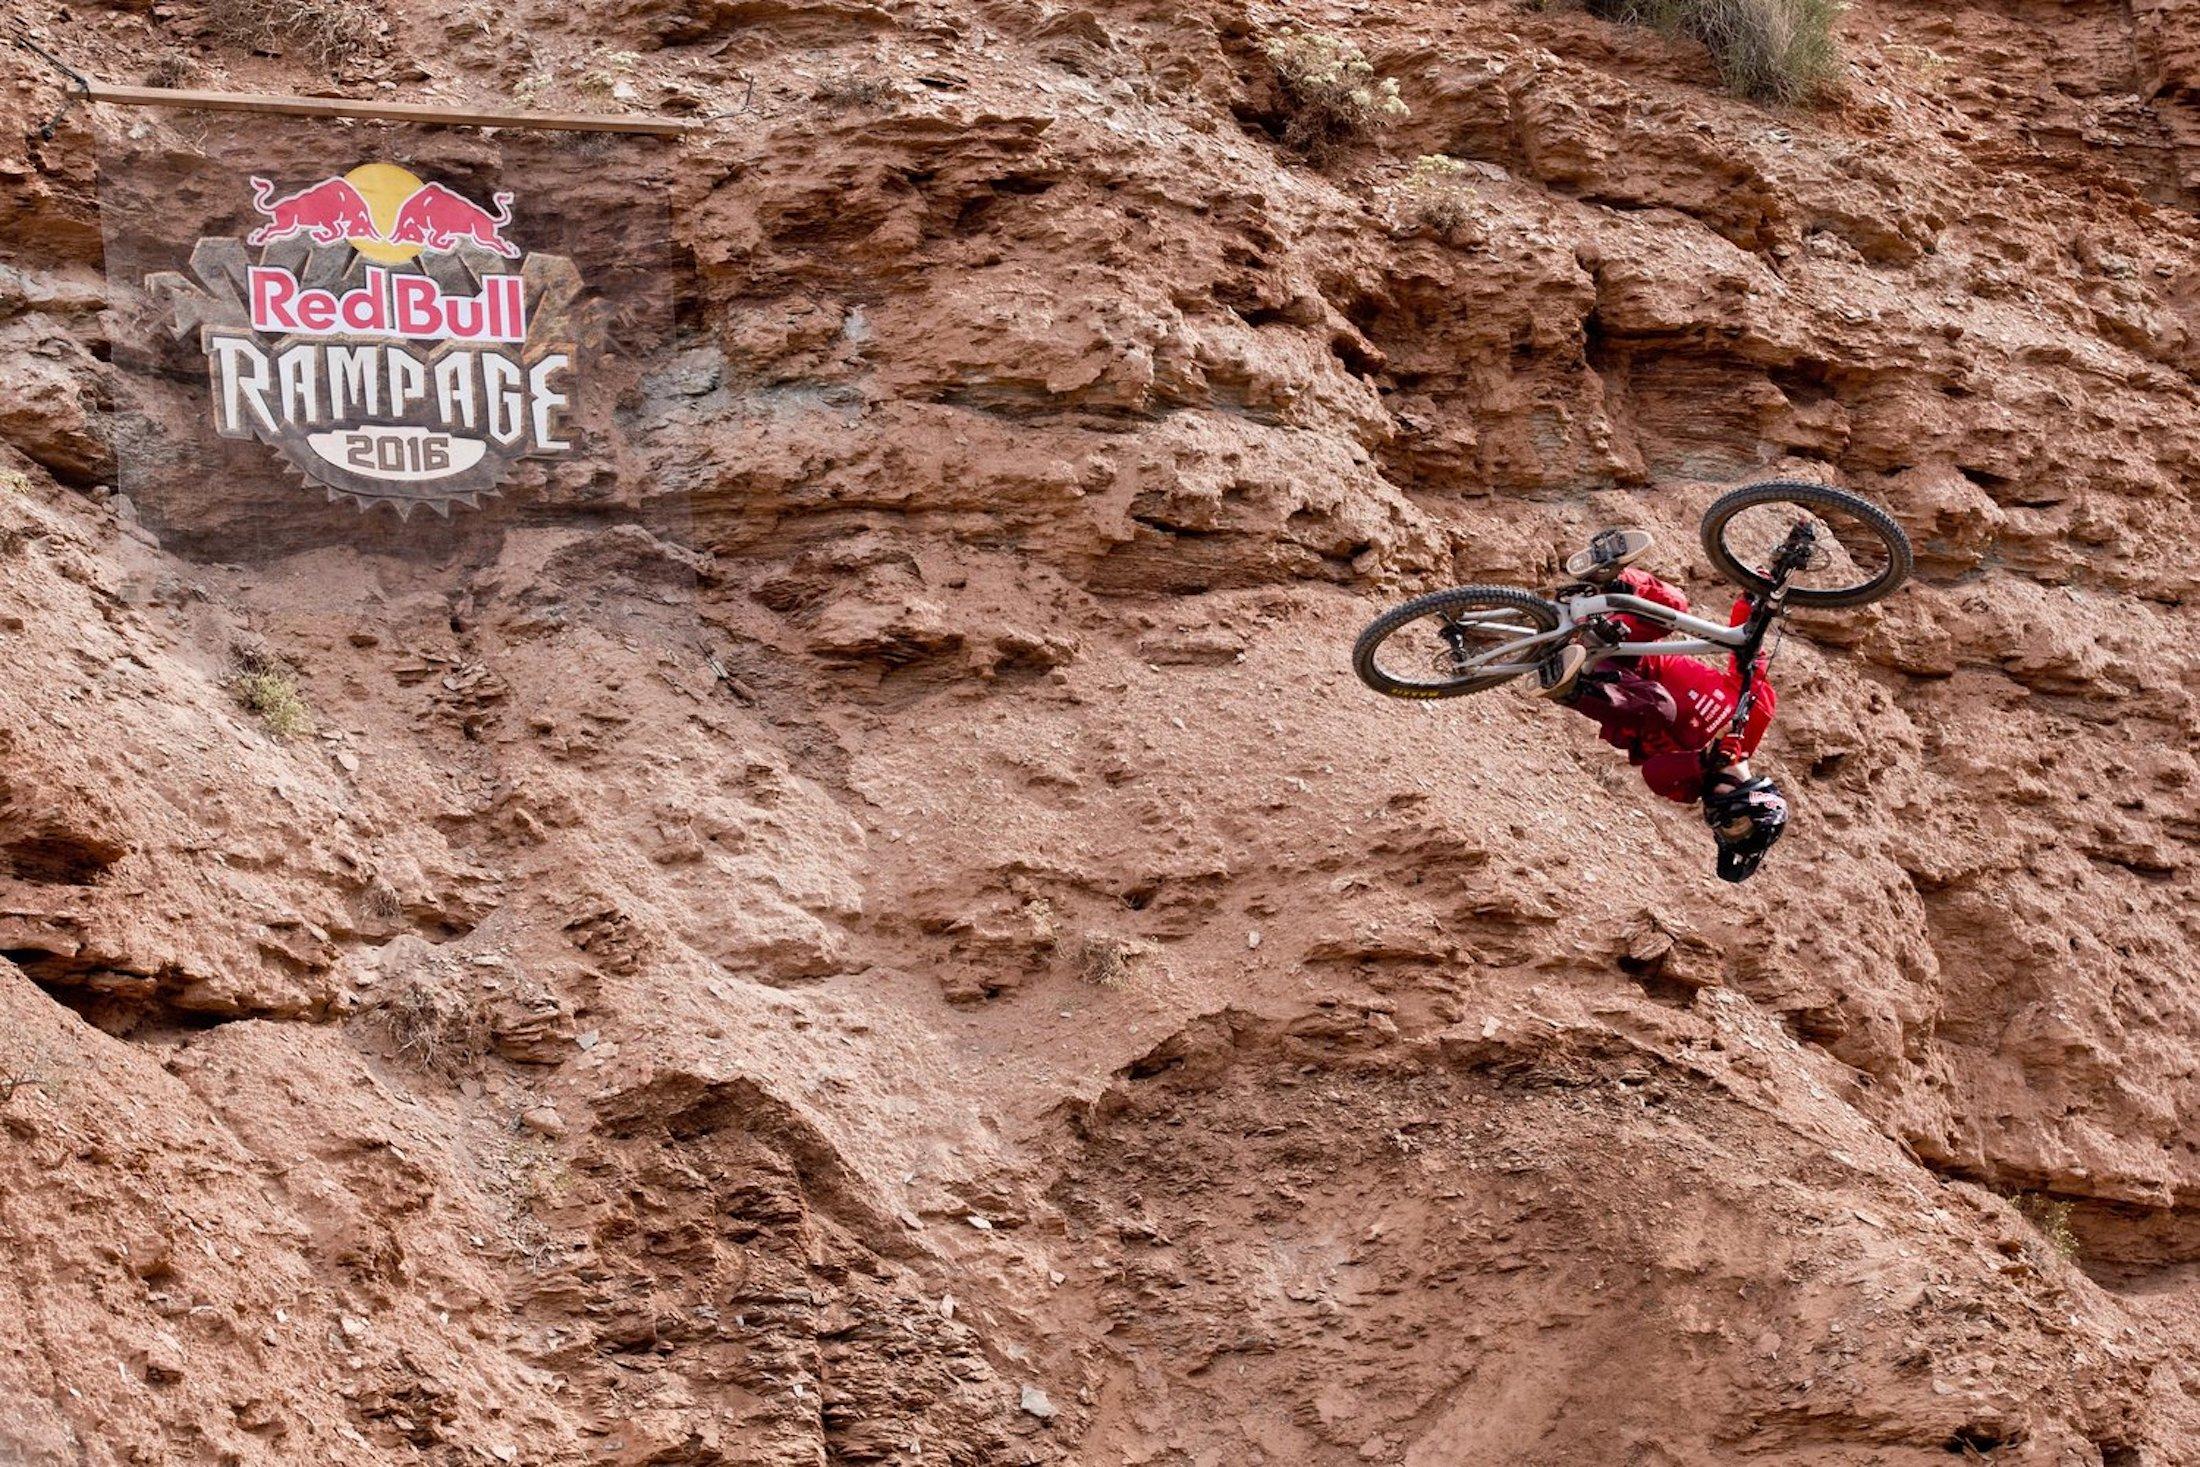 Brandon Semenuk flips at Red Bull Rampage